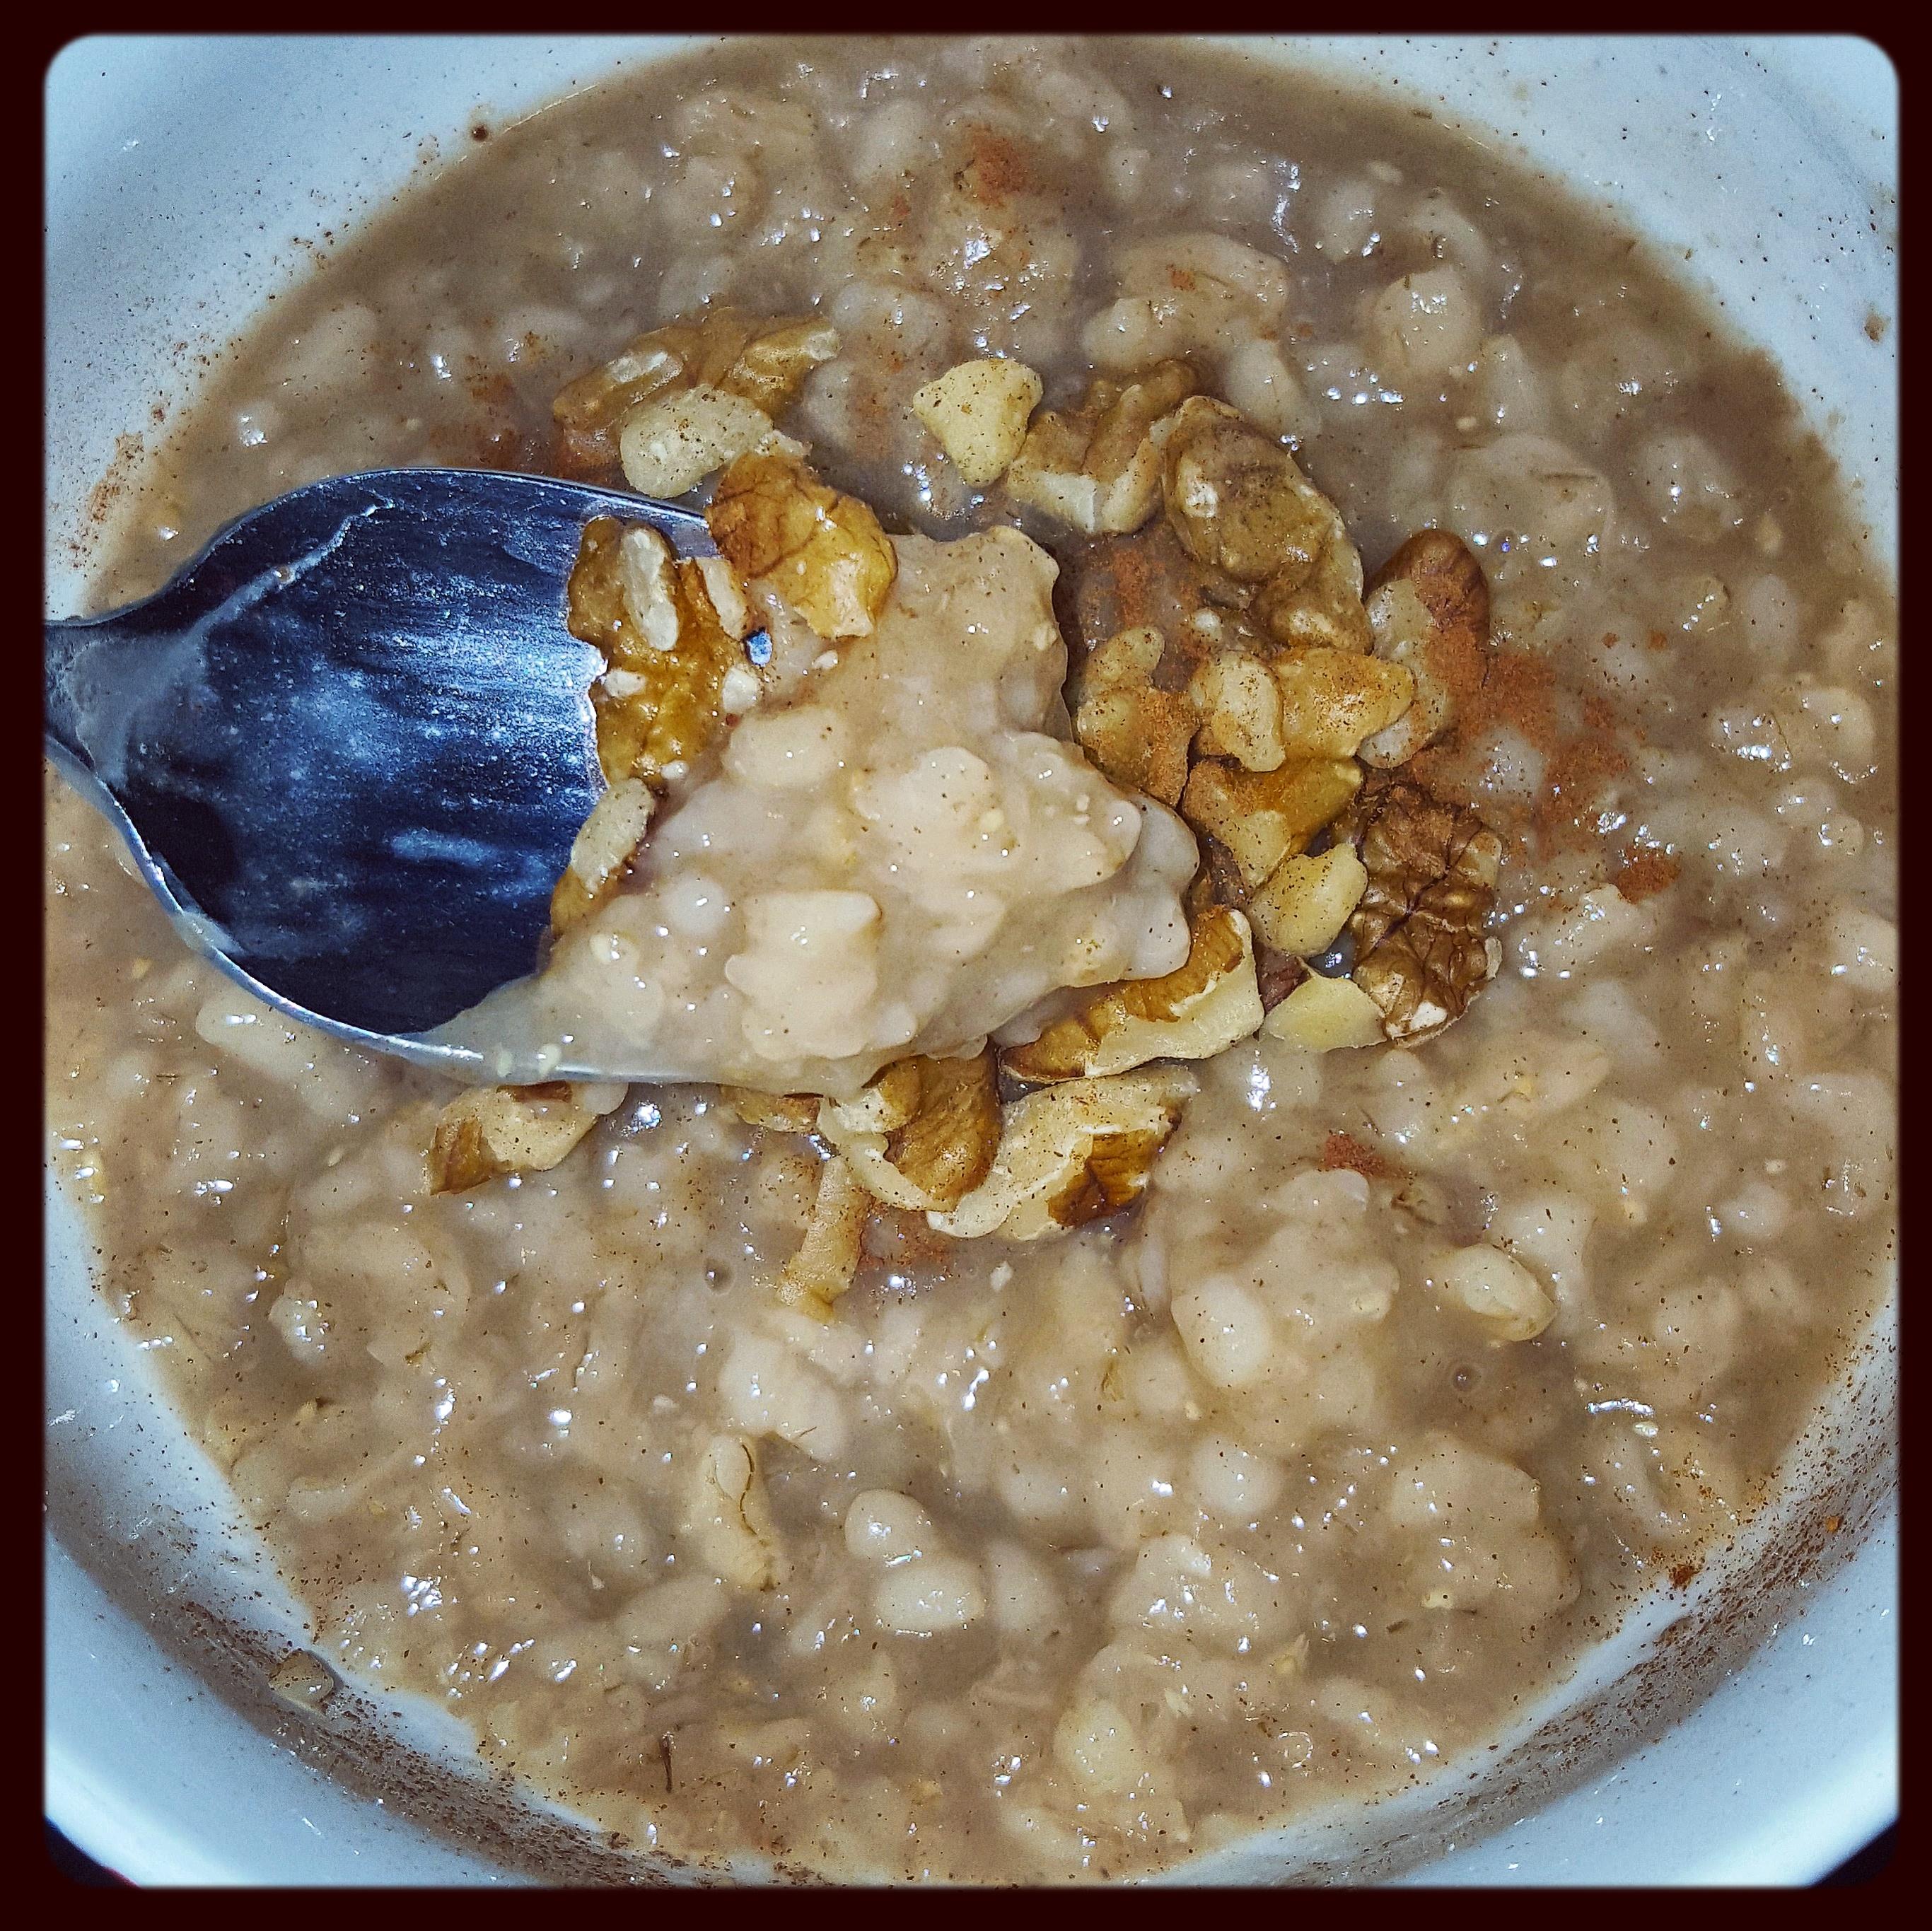 Instant Pot Maple Brown Sugar Oatmeal   Food Under Pressure